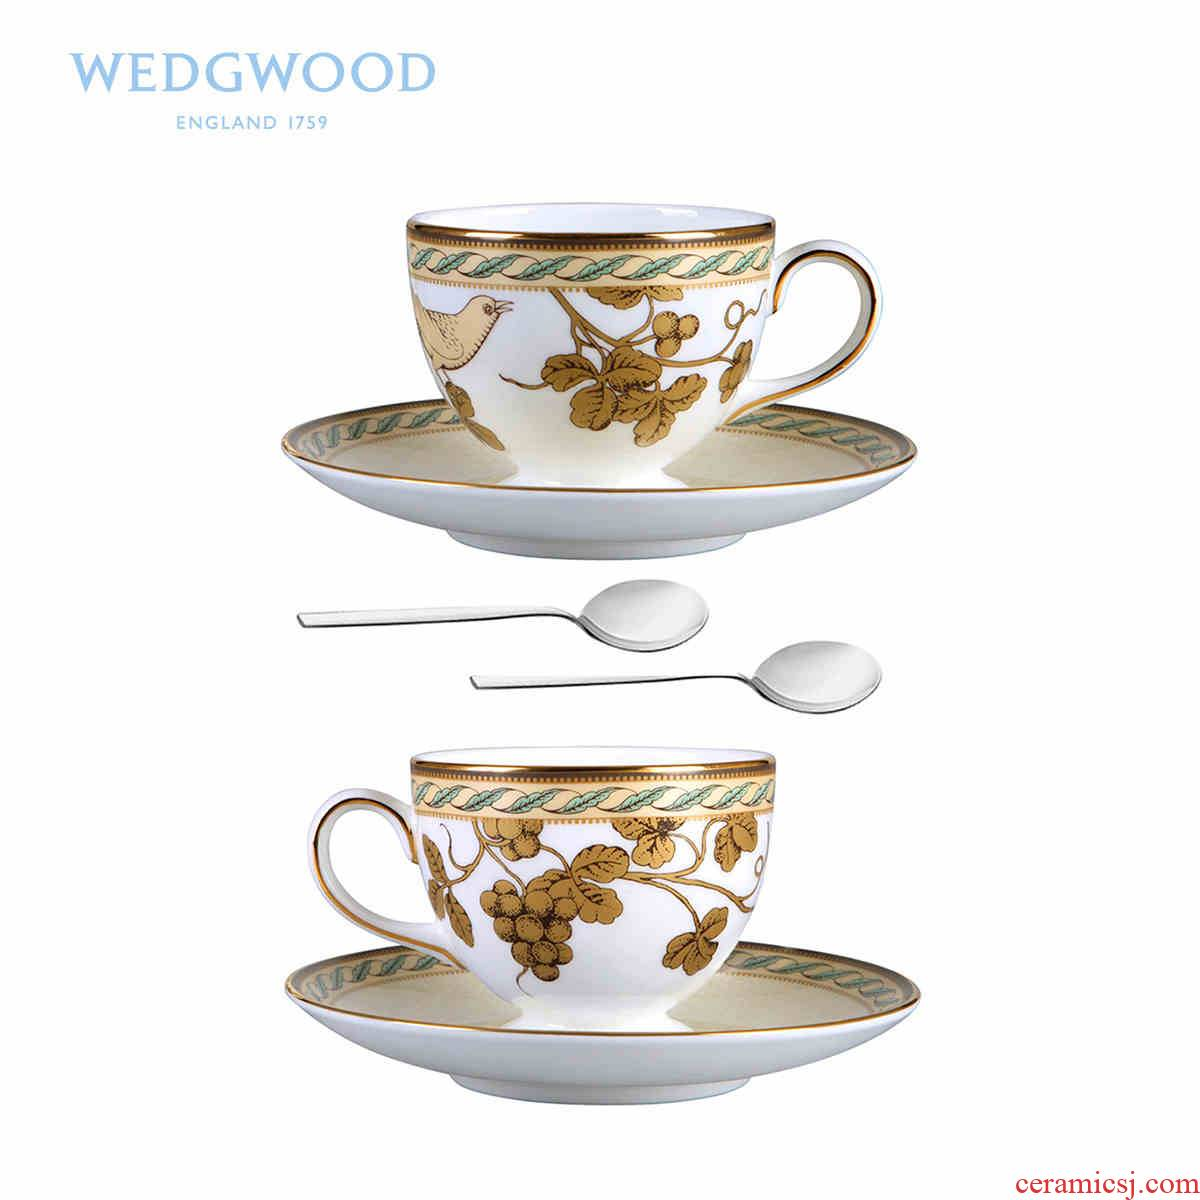 Wedgwood Golden Bird Golden Bird 2 cups disc 2 teaspoons of afternoon tea ipads China tea set gift boxes